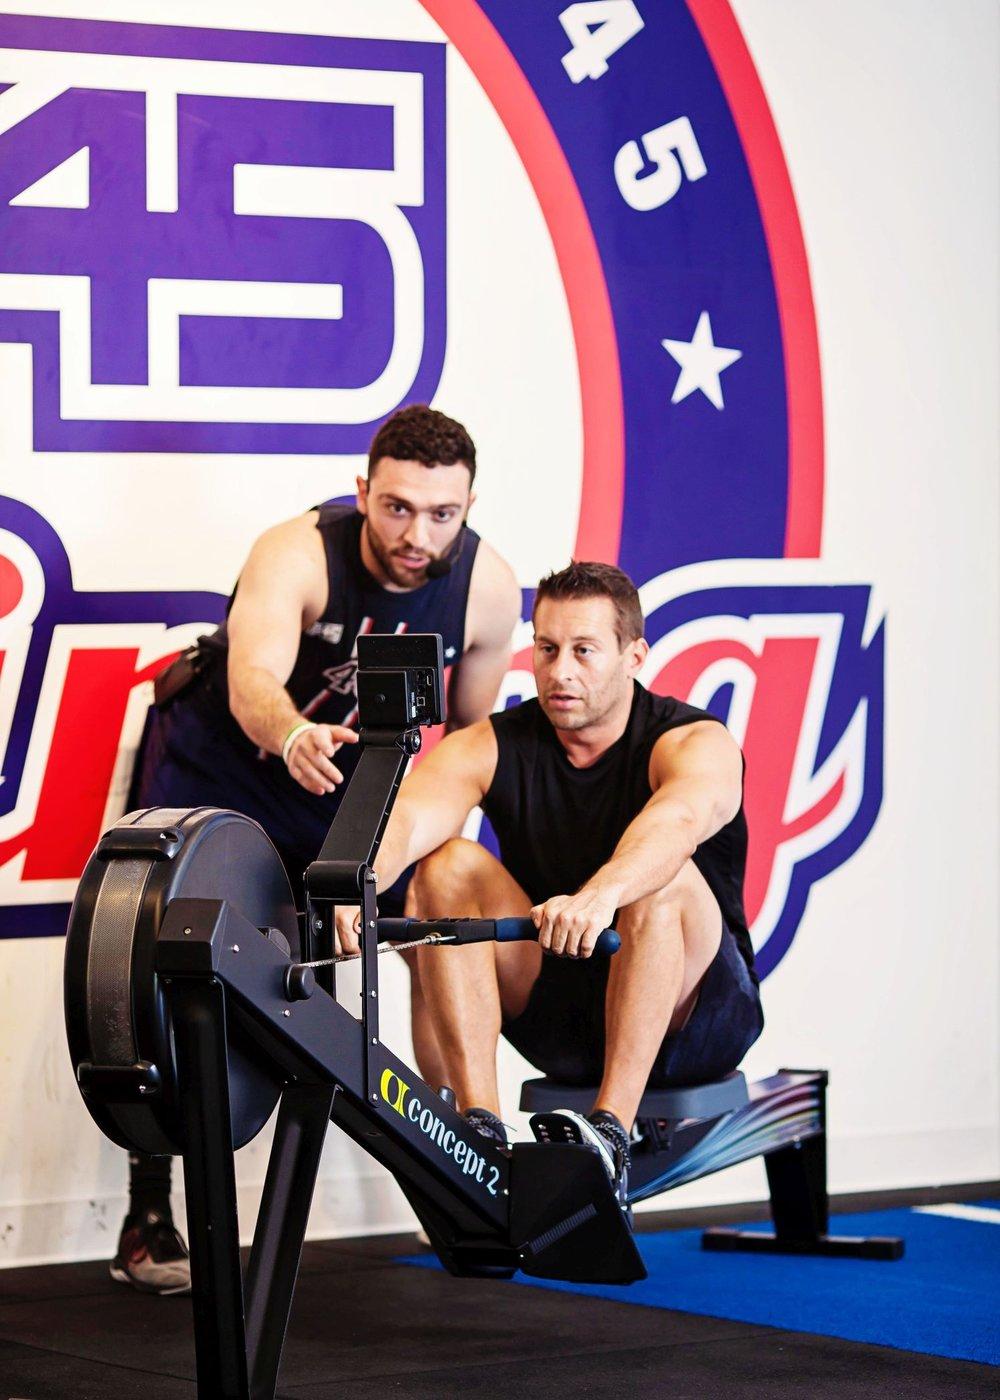 Fitness_gym_action_F45_buckhead-13.jpg